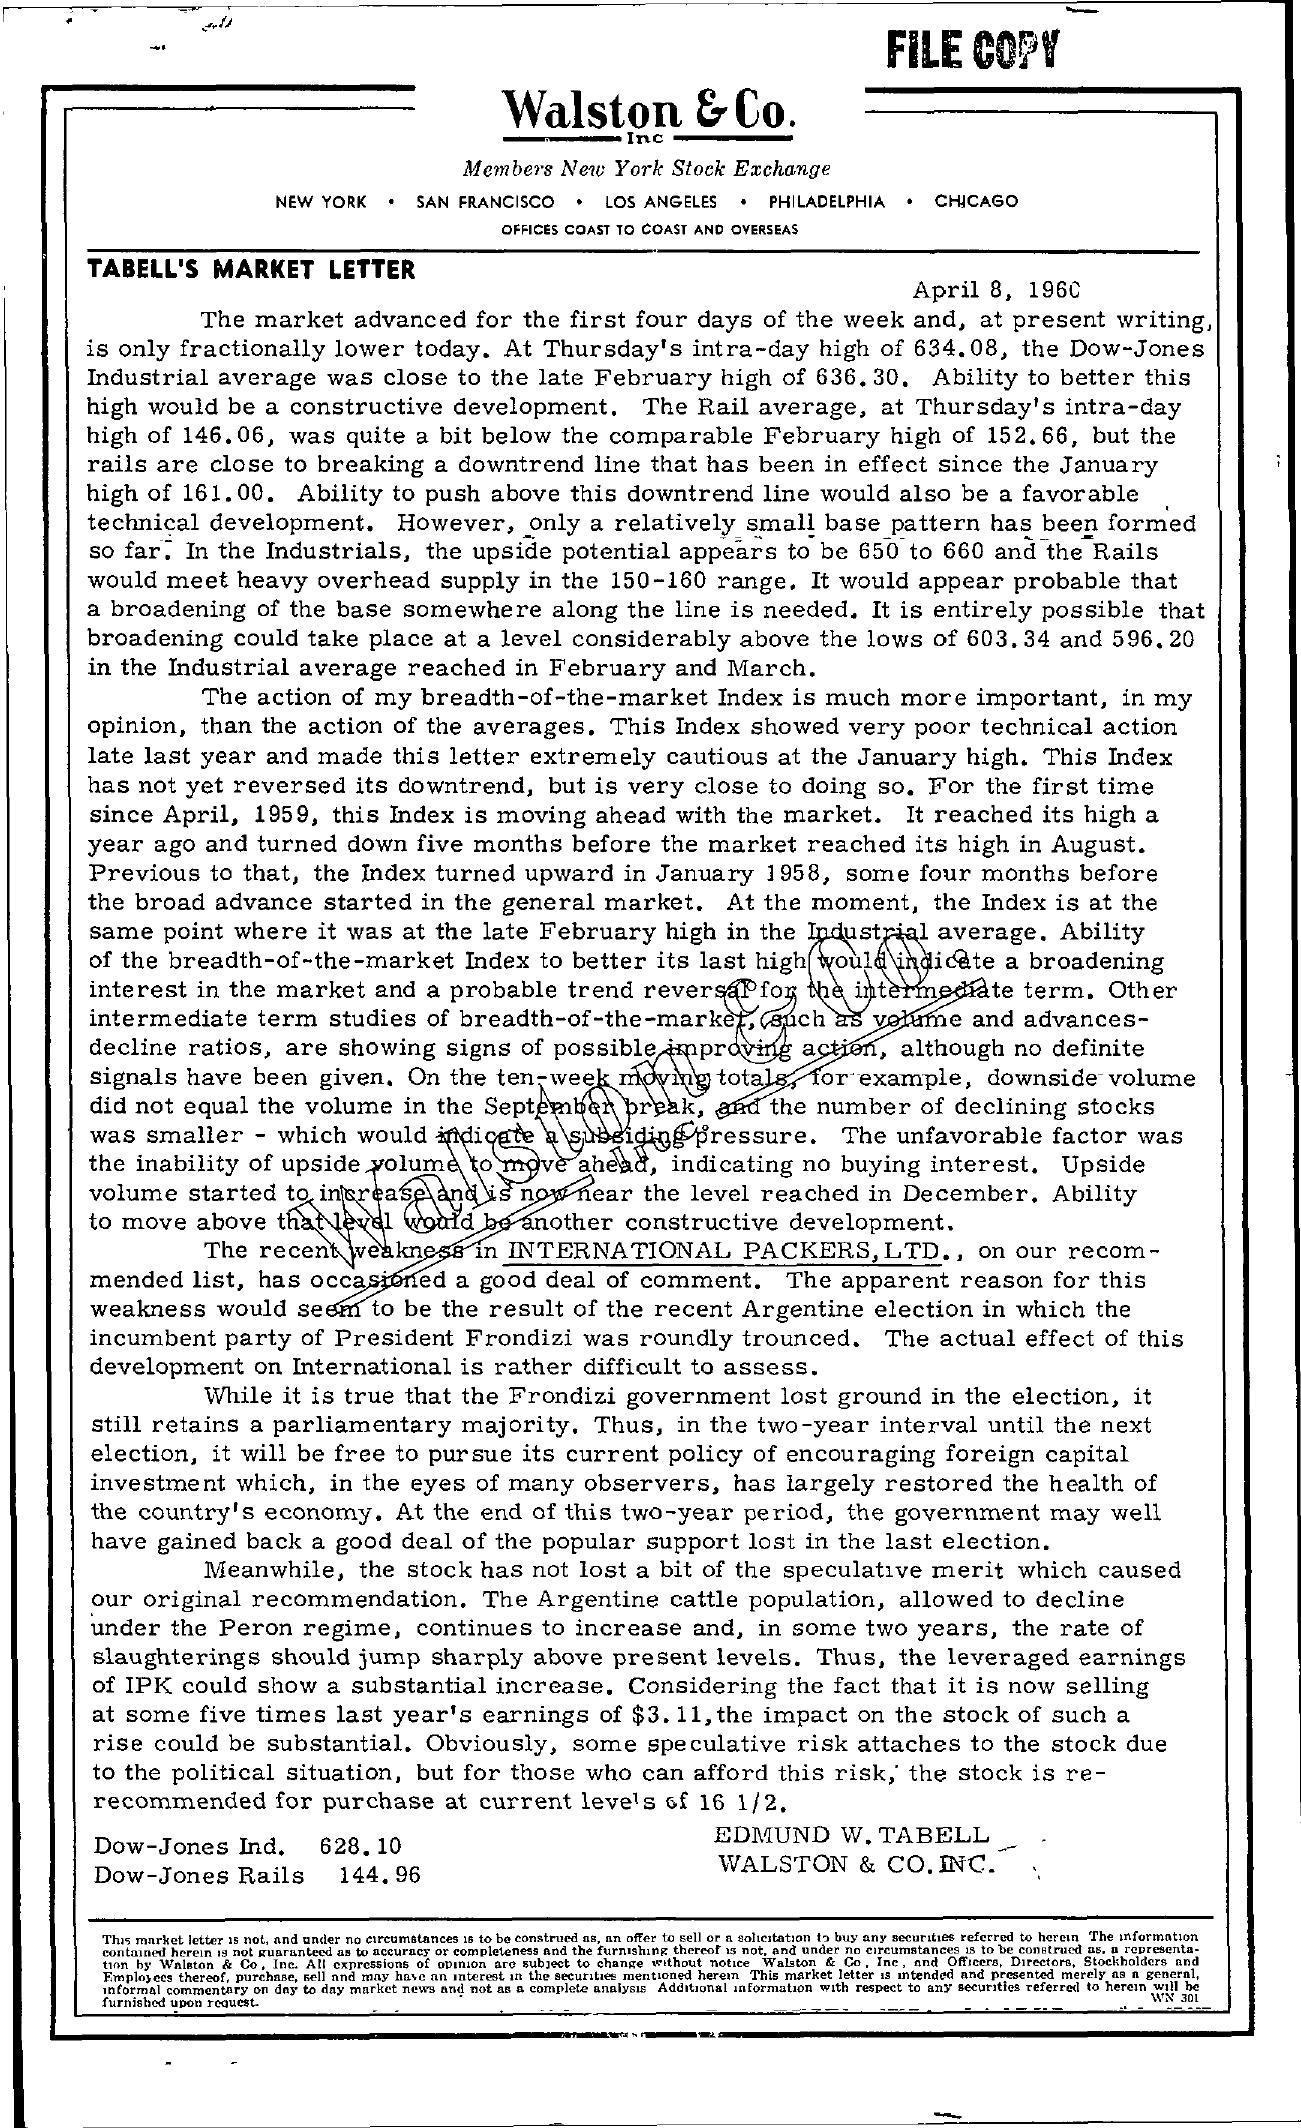 Tabell's Market Letter - April 08, 1960